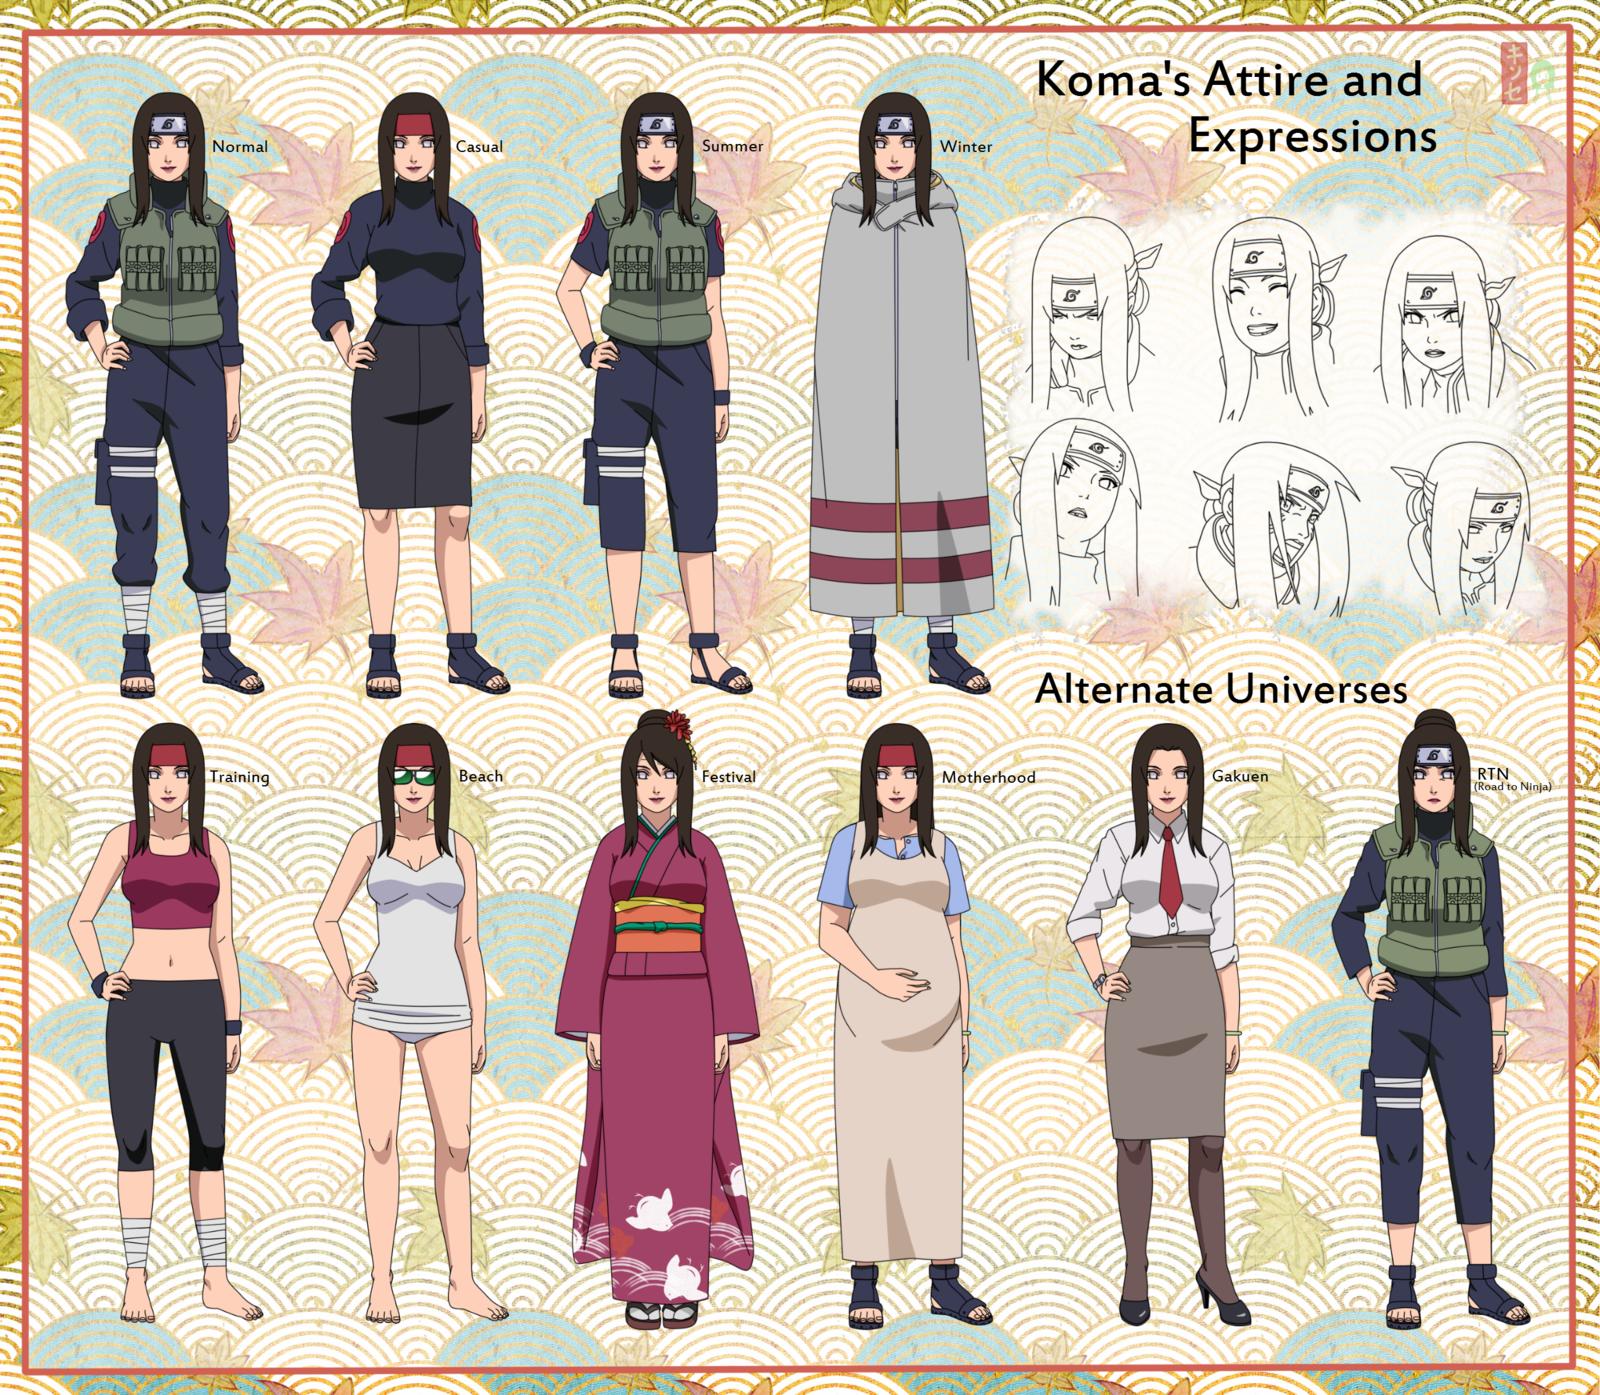 Koma's Attire and Expressions by Akane-Sasu-Sora ...